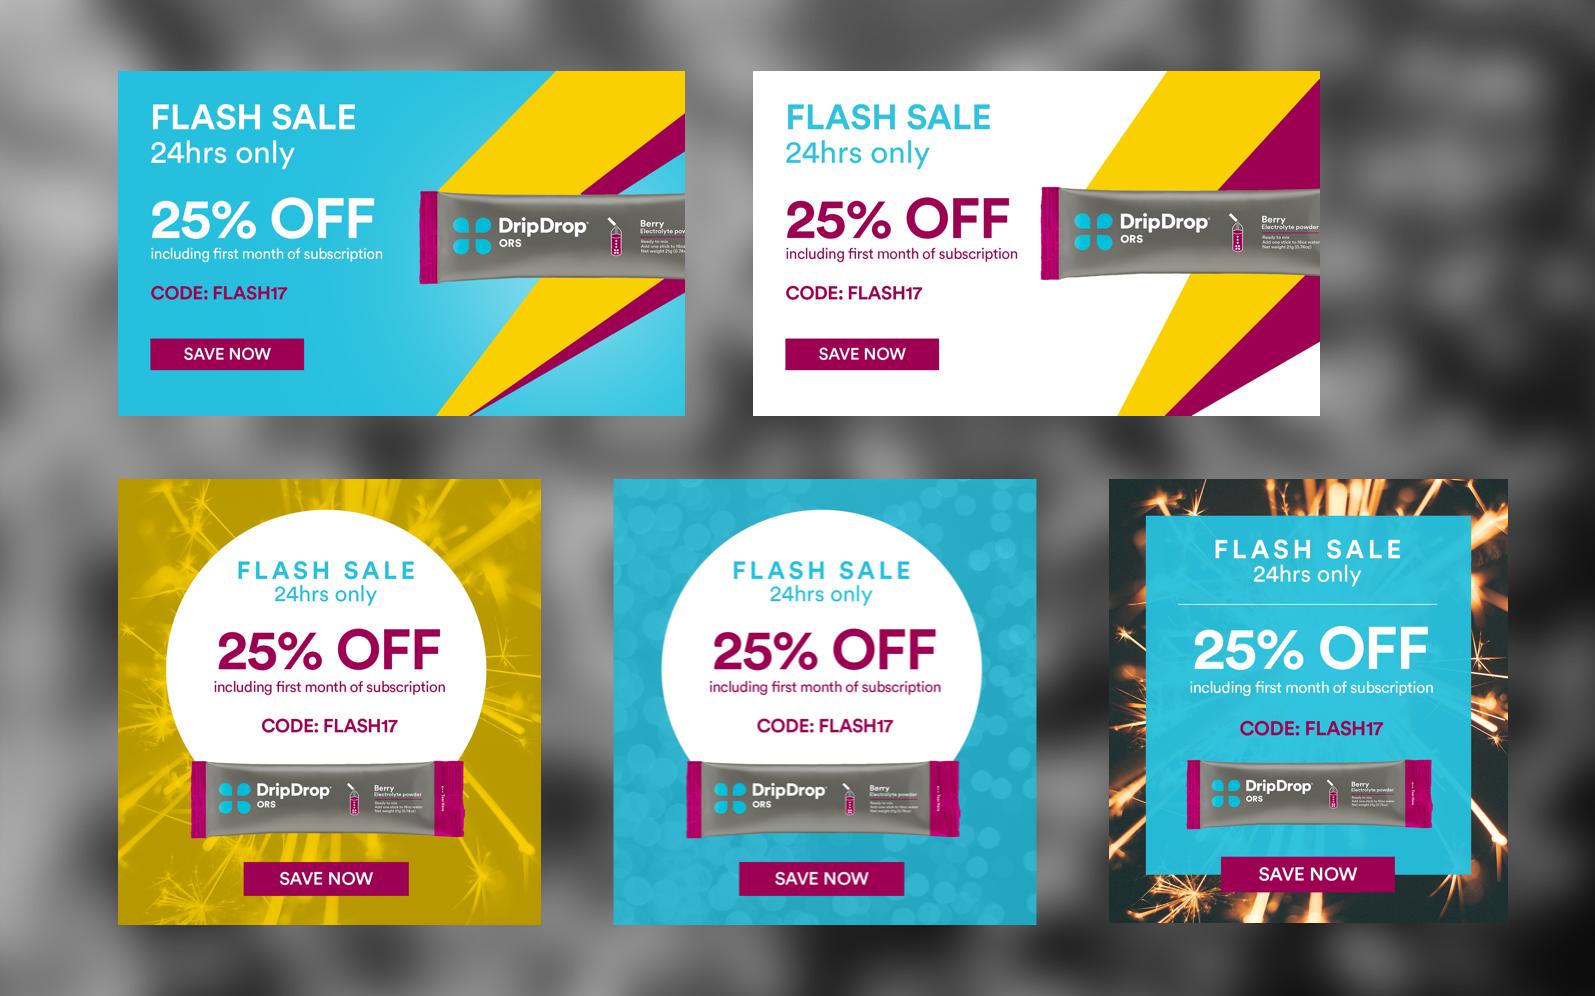 Explorations on flash sale visuals.